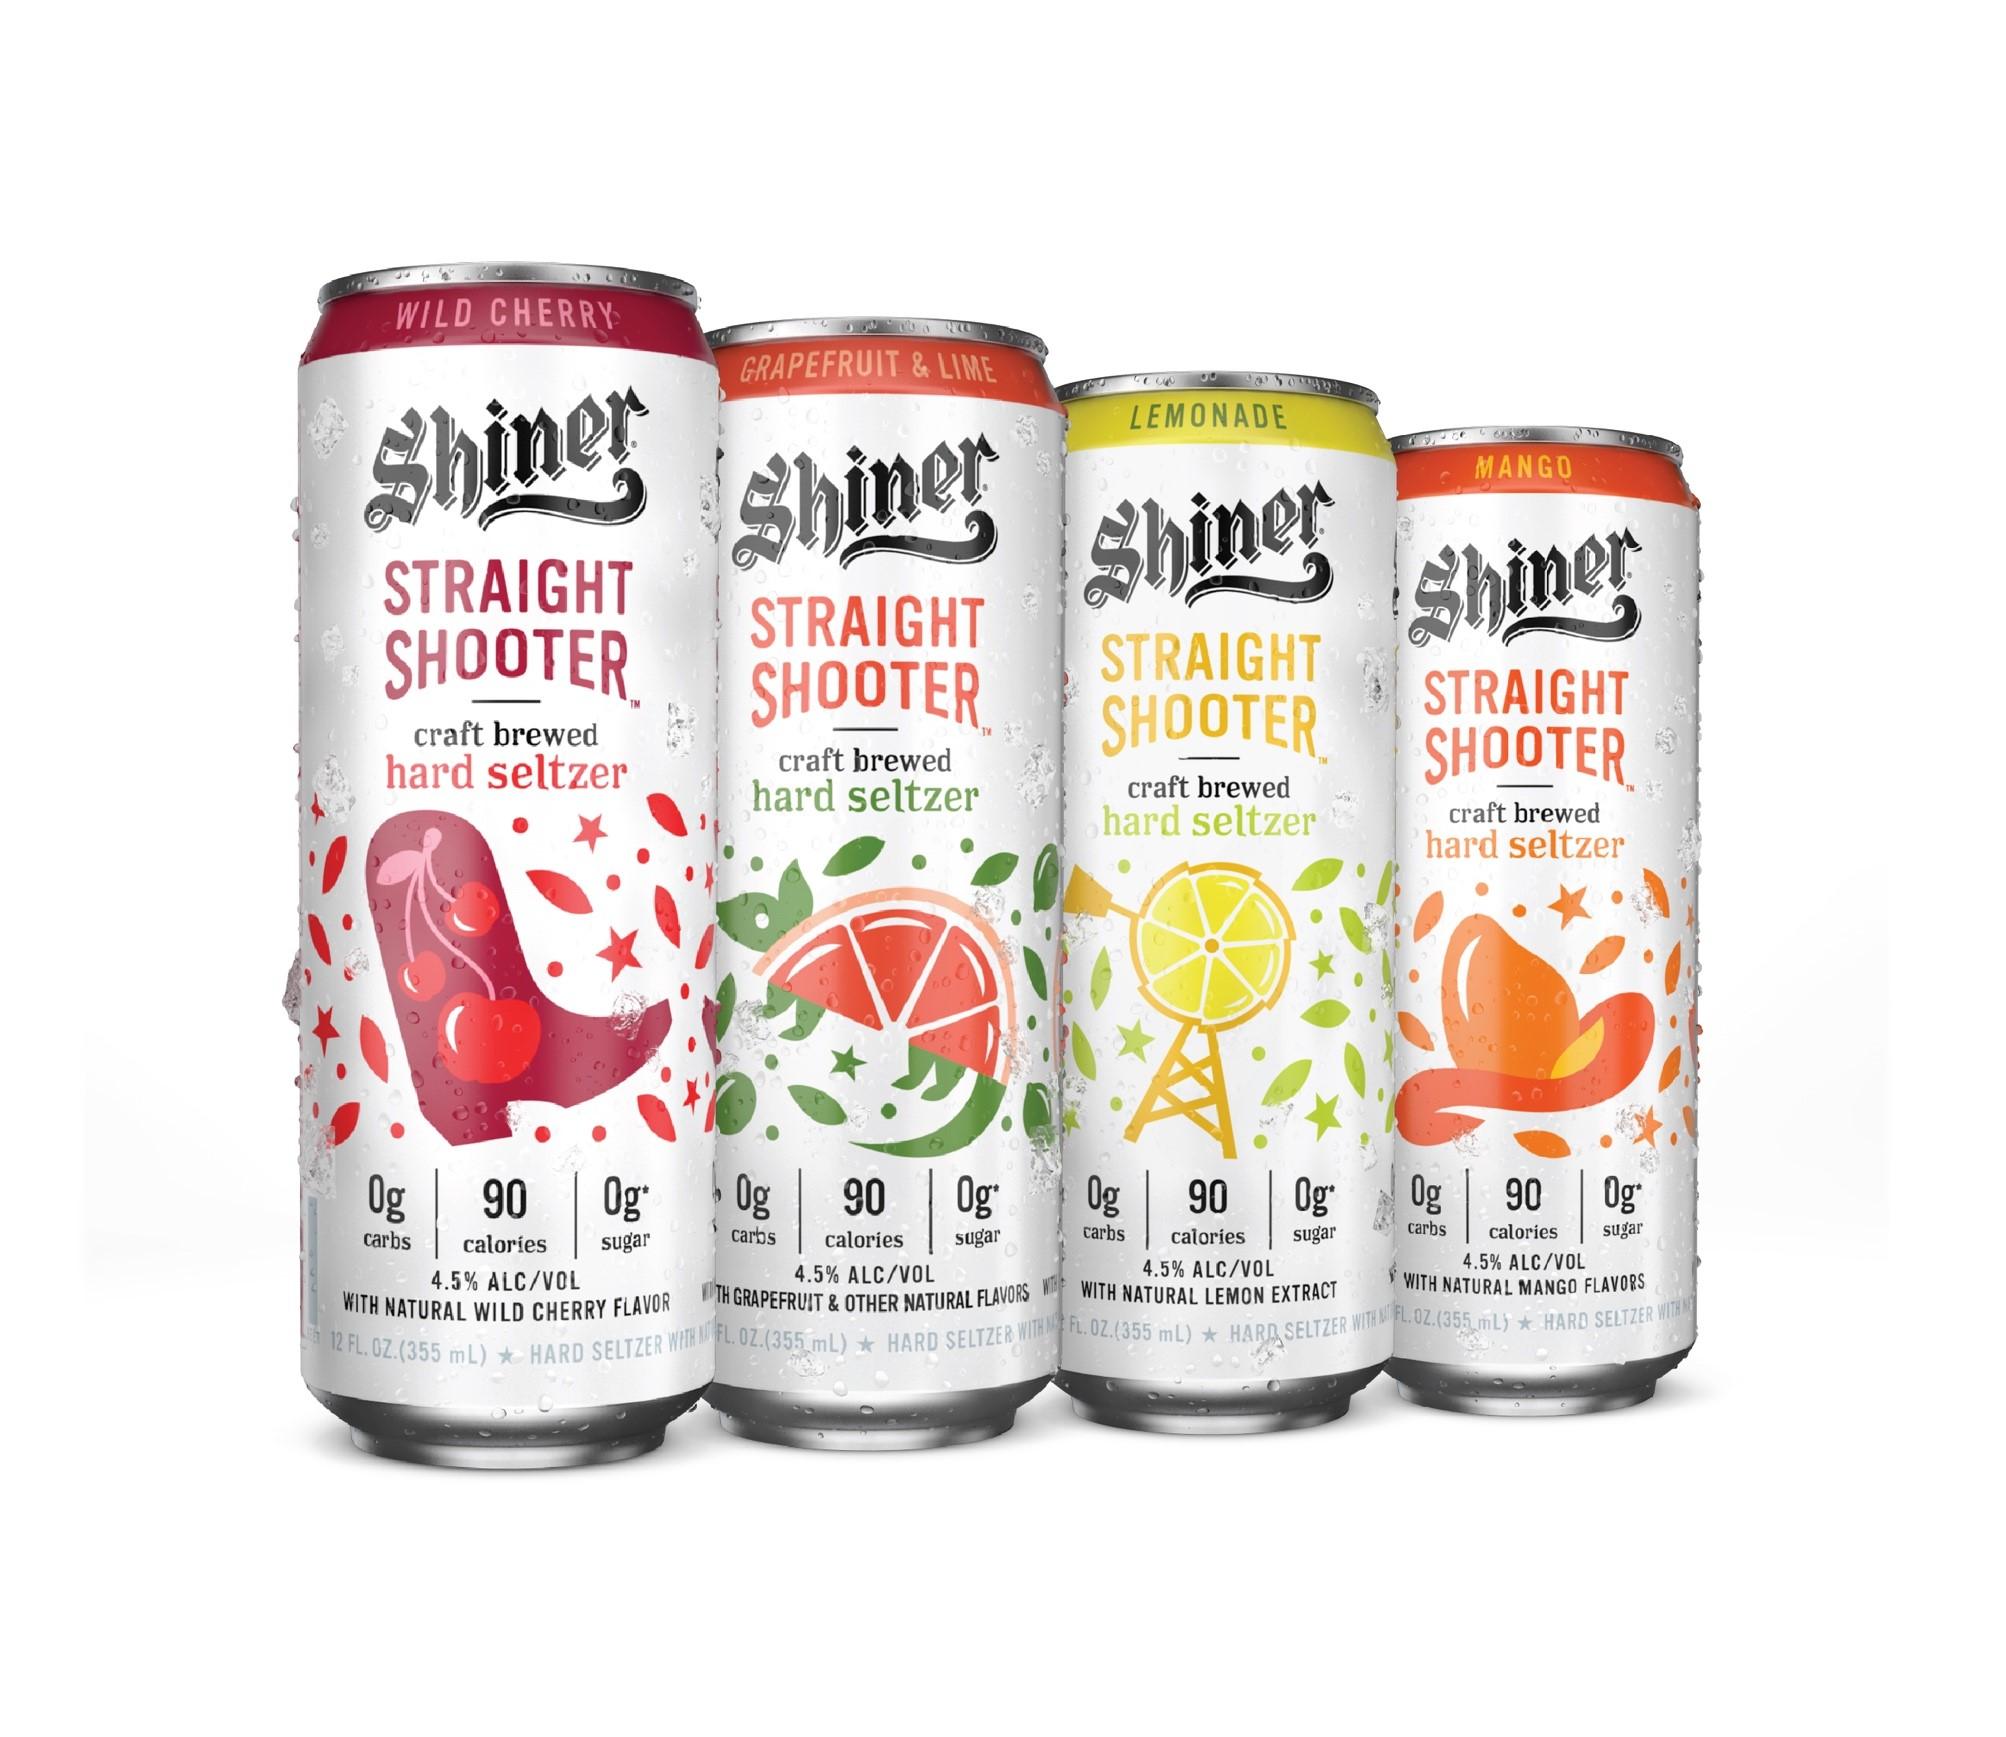 The Shiner Straight Shooter hard seltzer